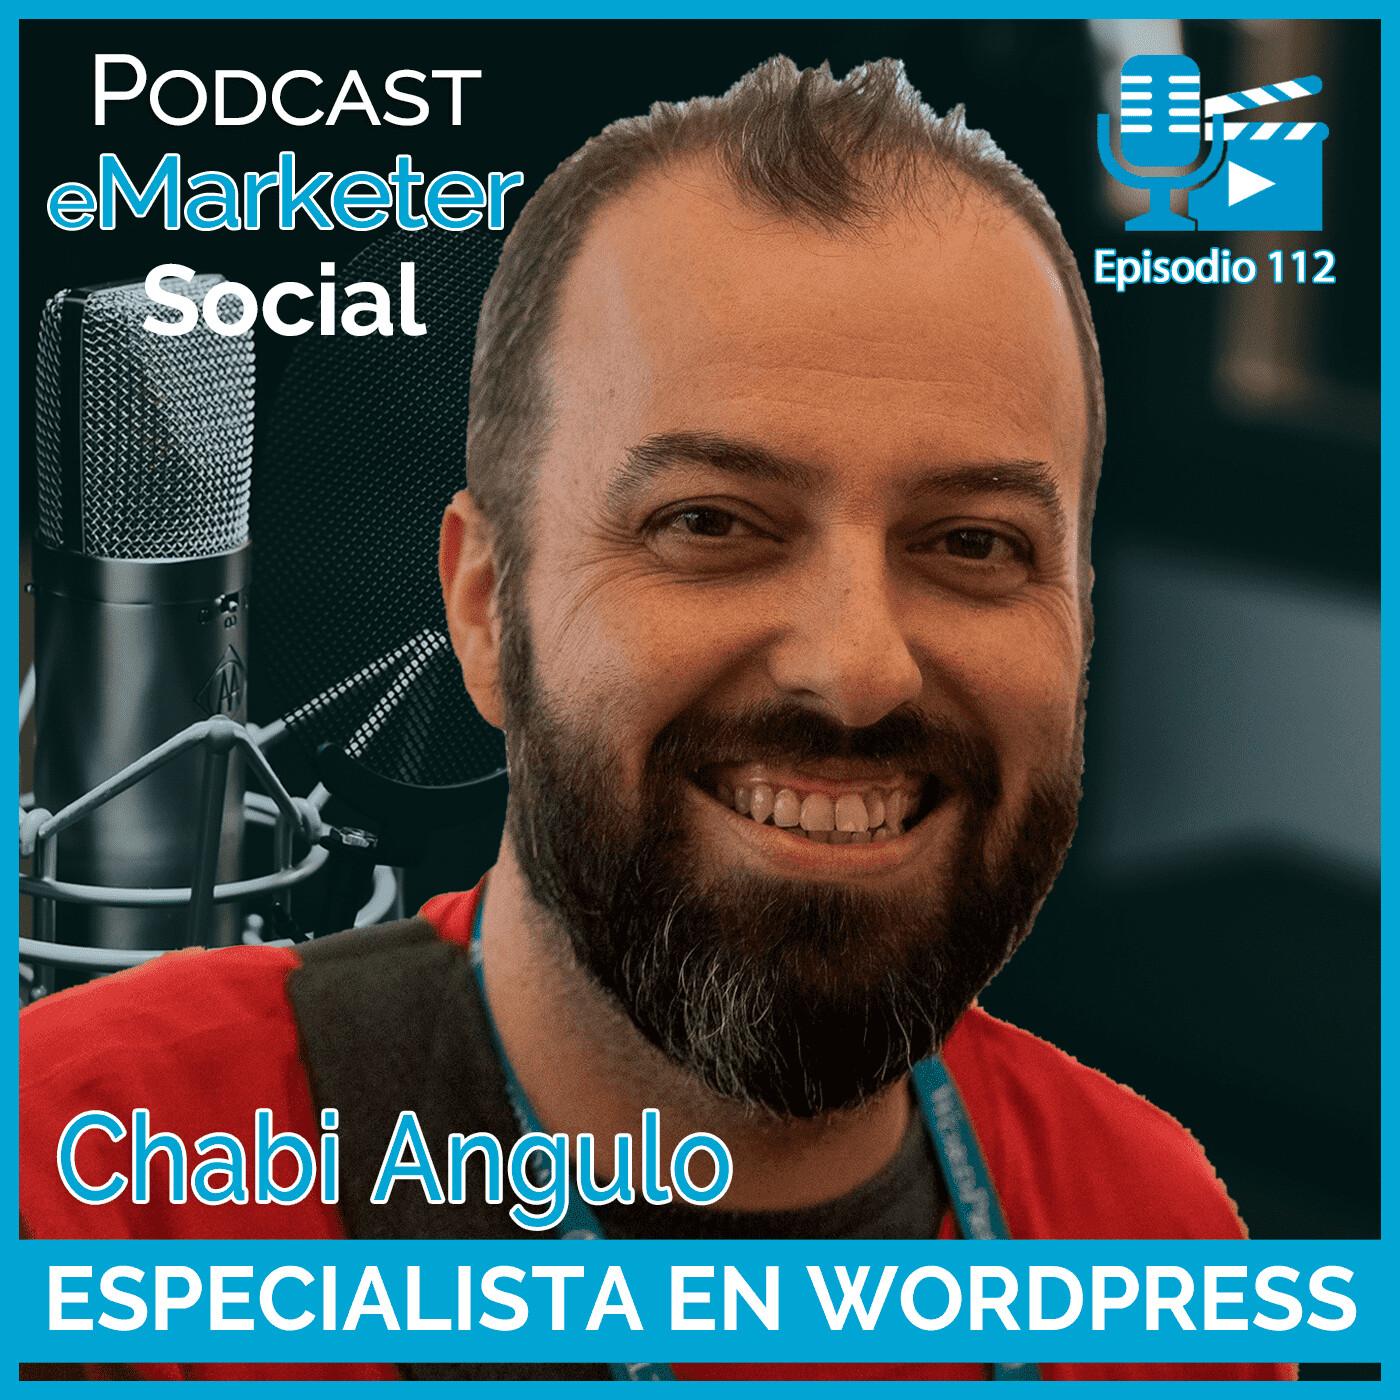 112 Chabi Angulo Freelance trabajando con WordPress en Podcast eMarketerSocial